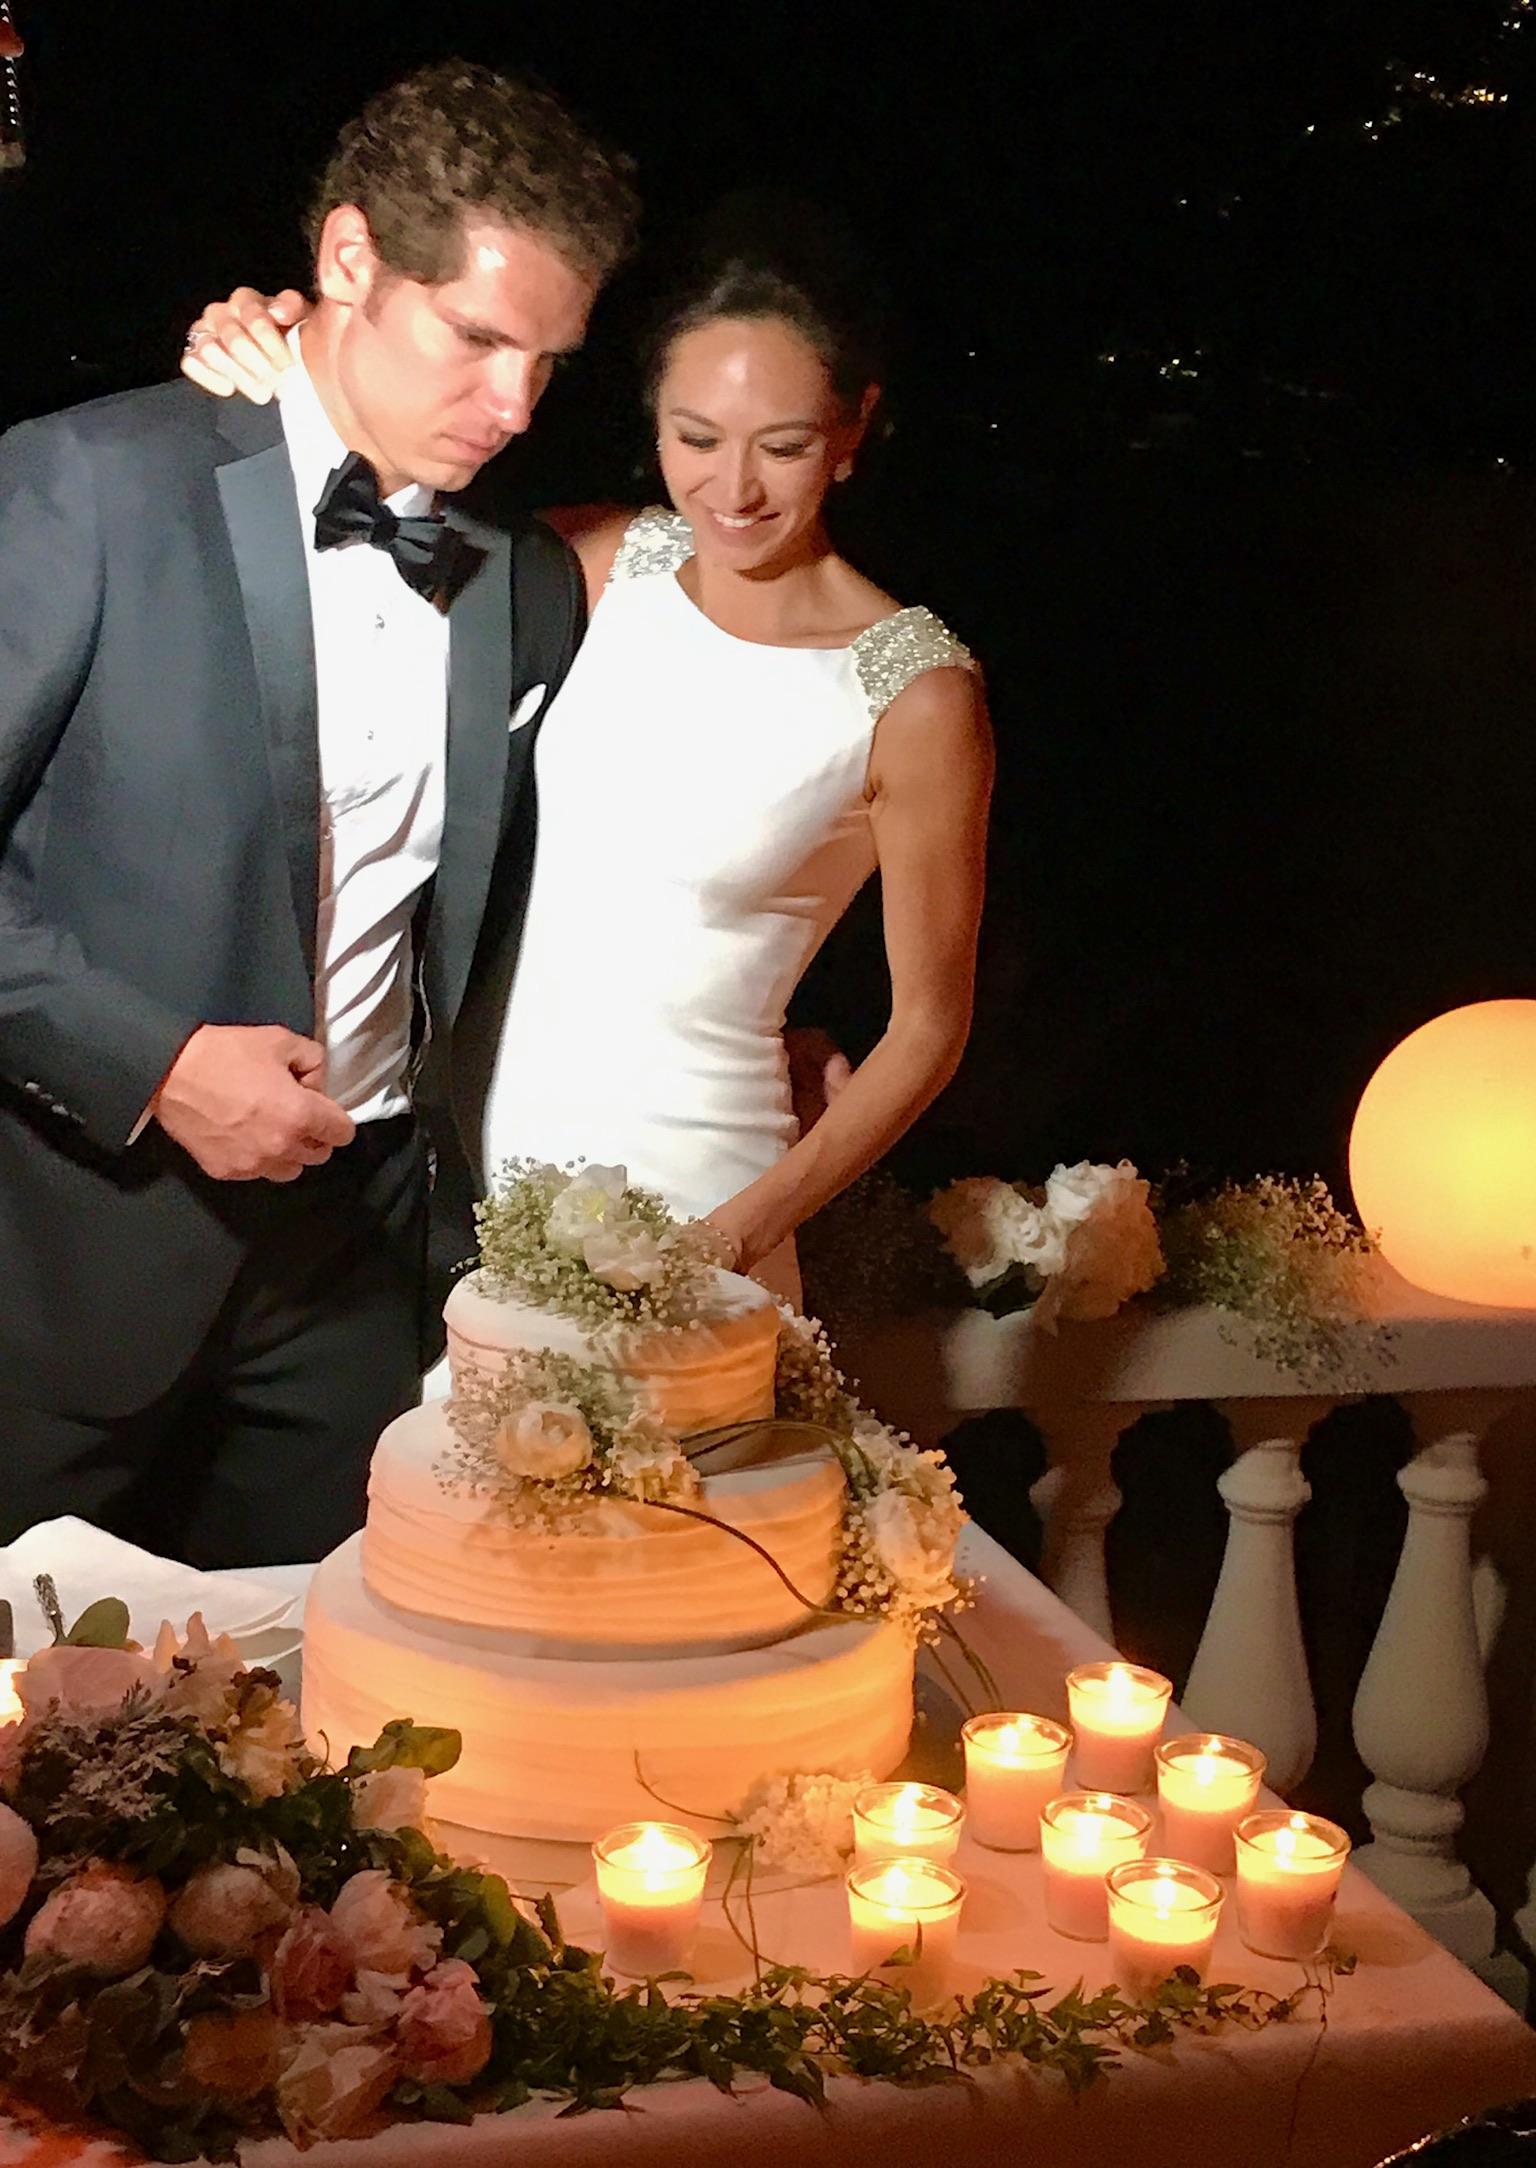 https://www.weddingamalfi.com/wp-content/uploads/Nathalie-and-Benjamin-wedding-in-Positano-28.jpg